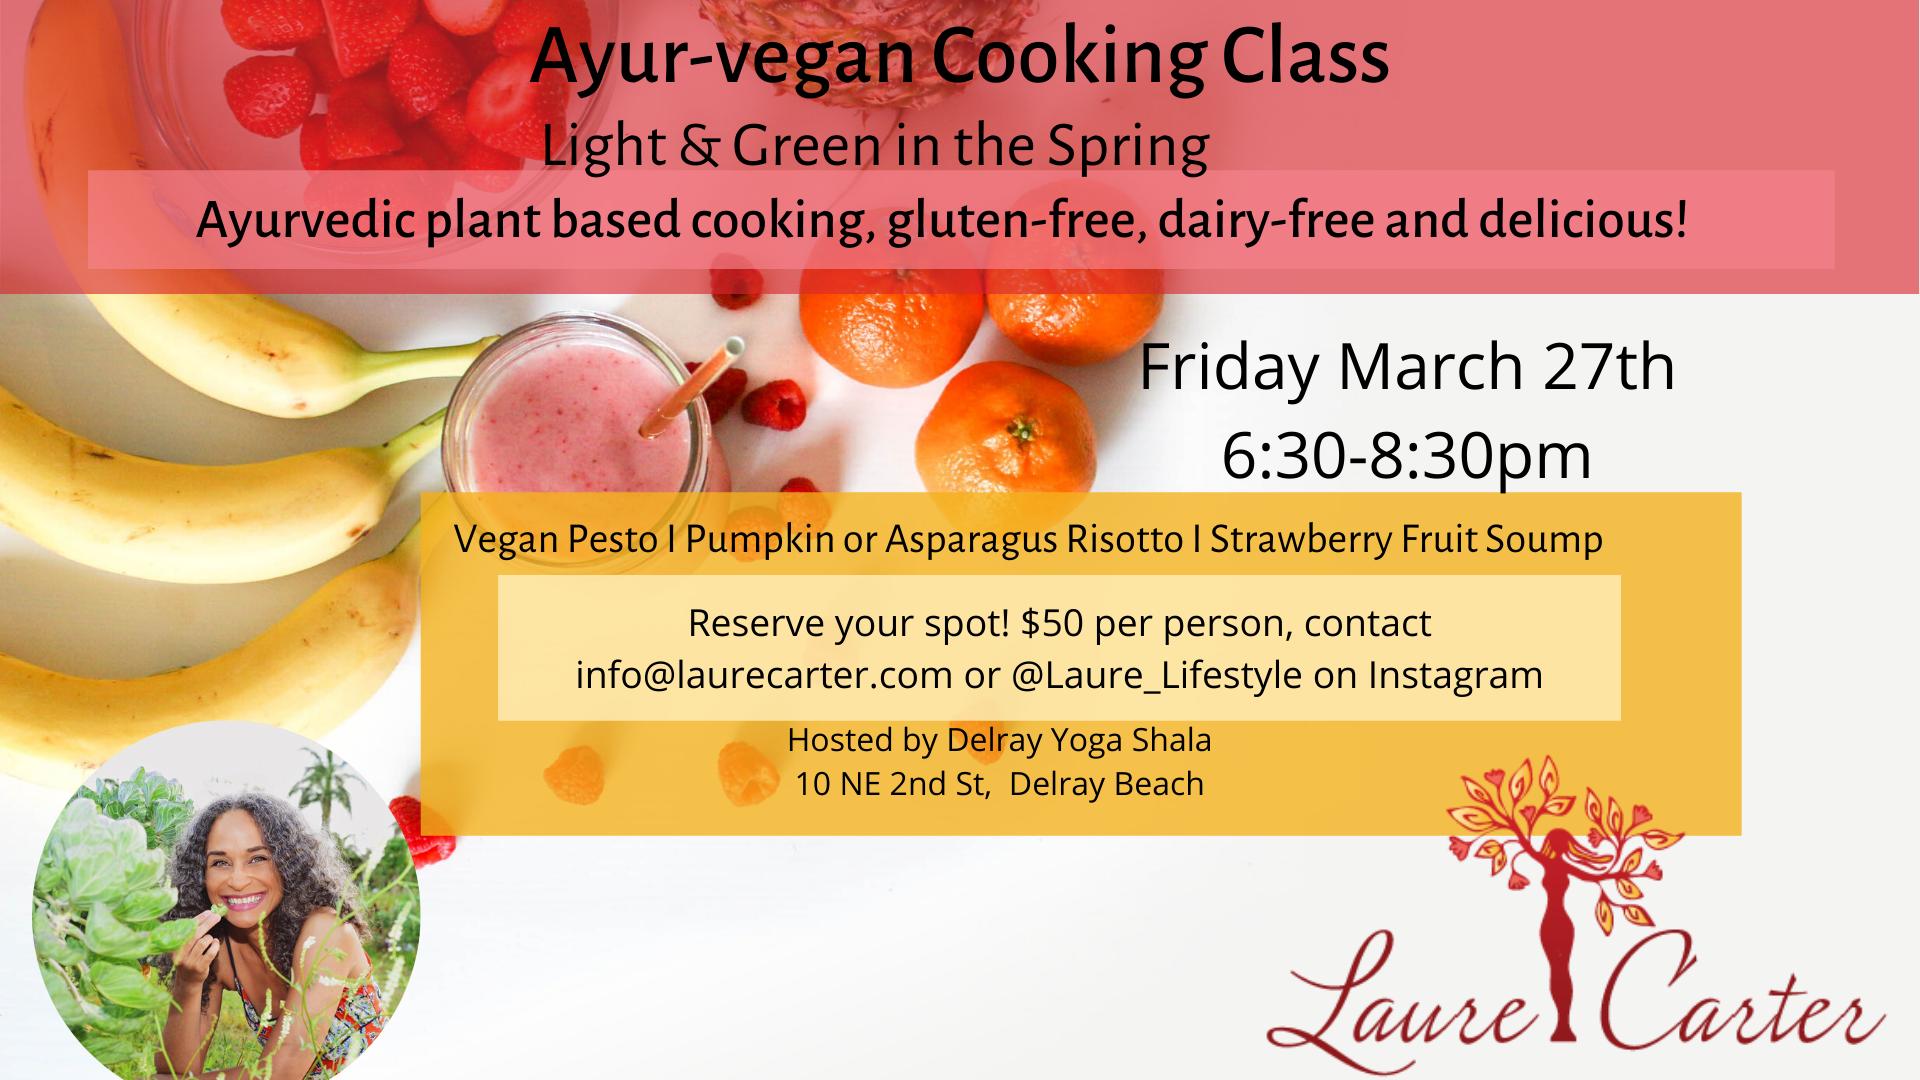 Ayurvedic vegan cooking class in delray